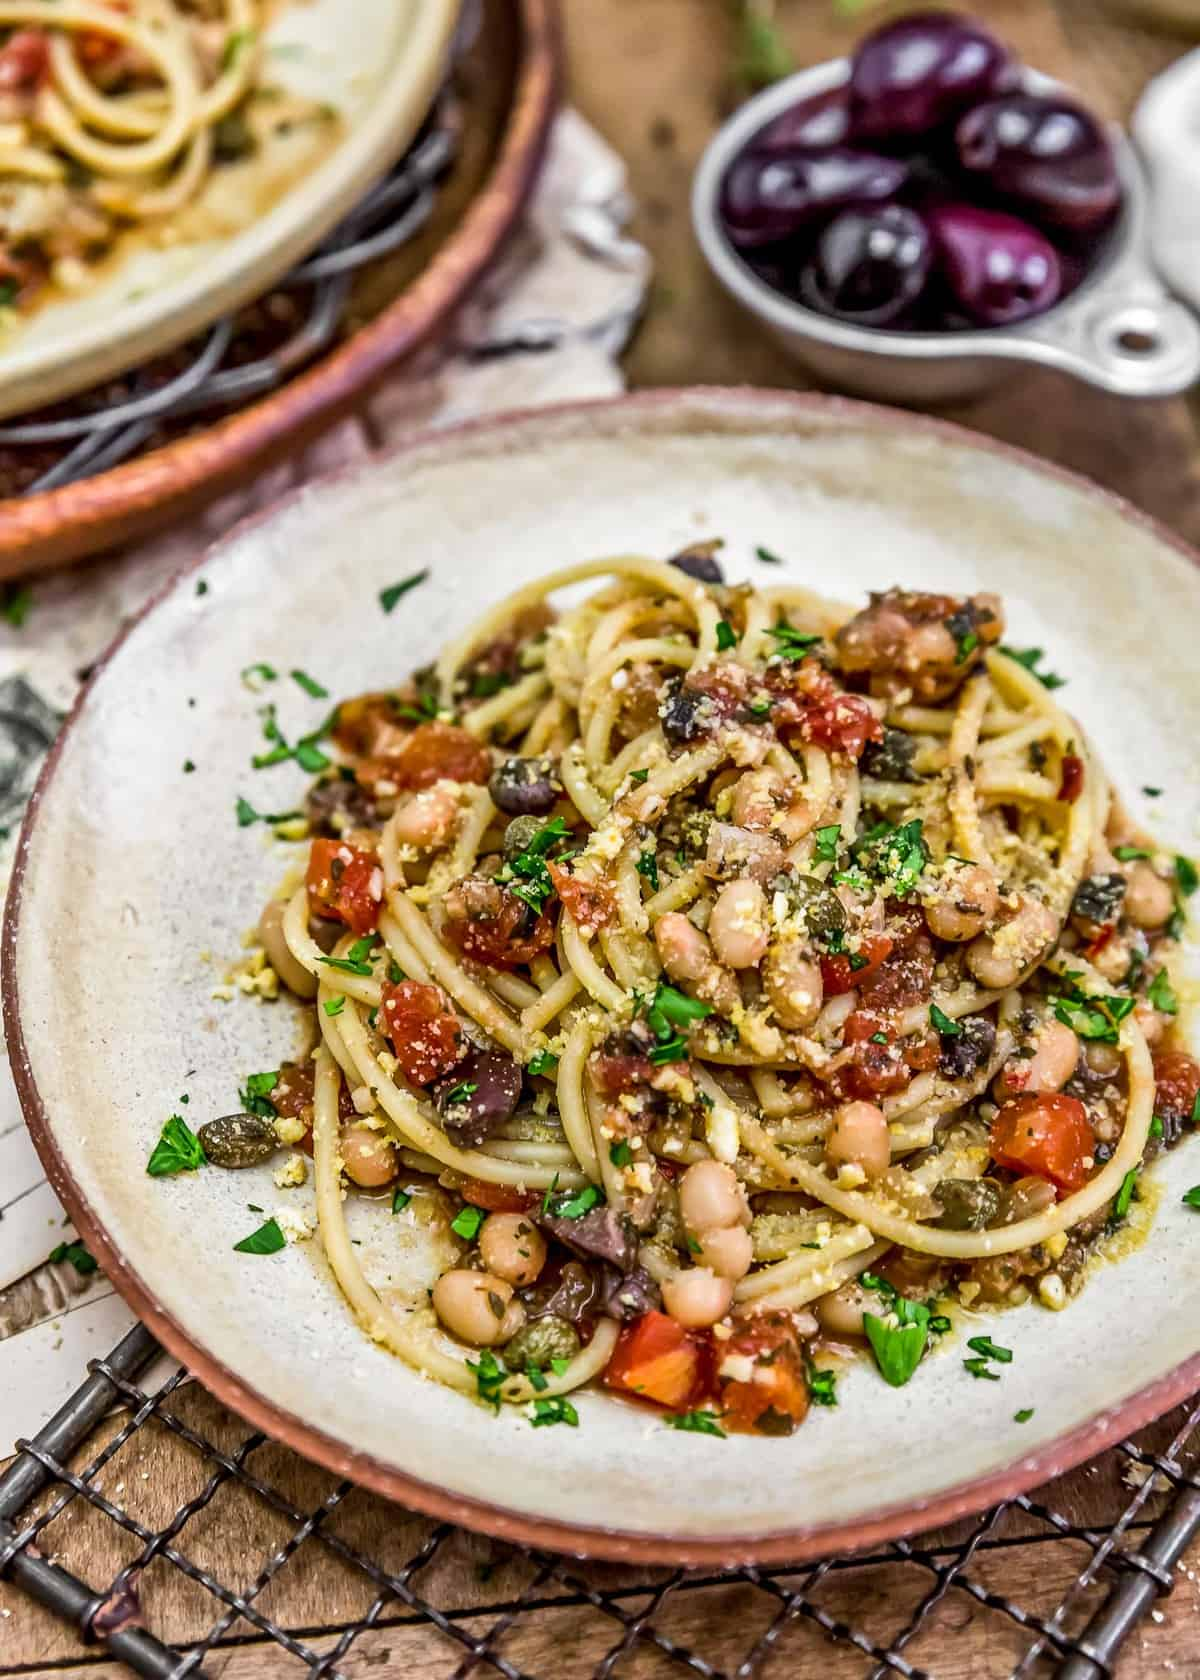 Plated Pasta Puttanesca